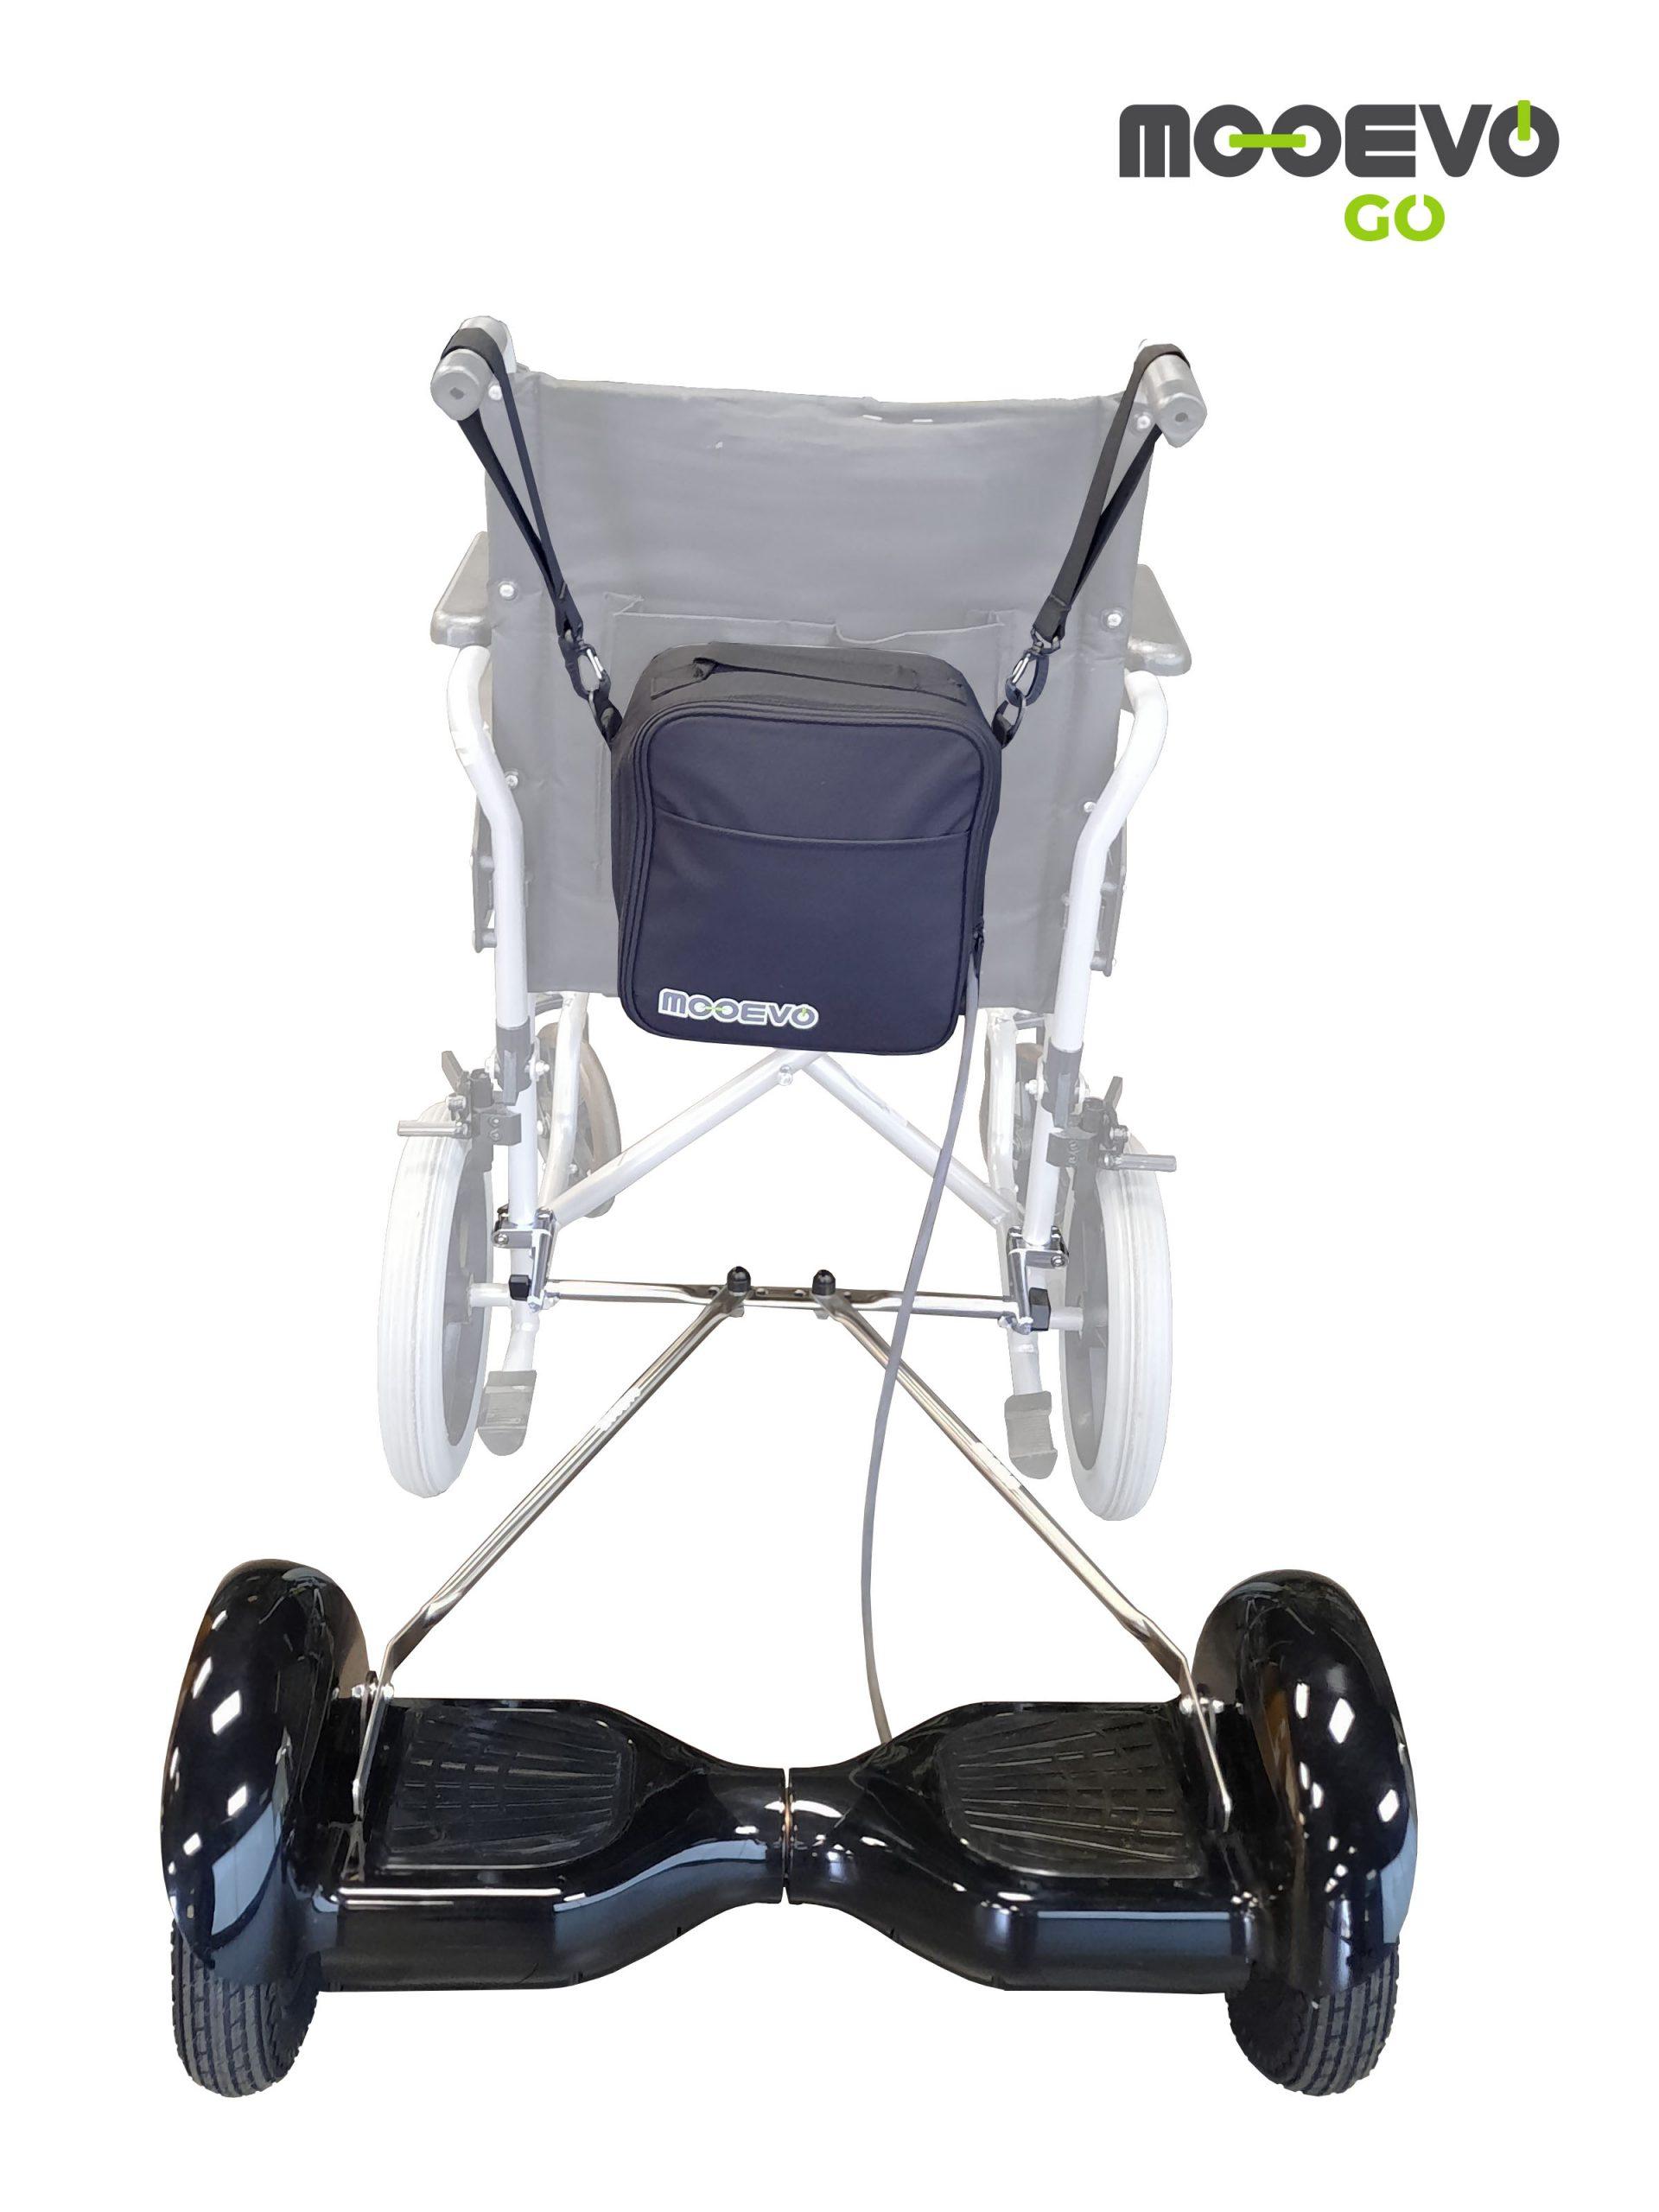 motor asistente silla ruedas mooevo go